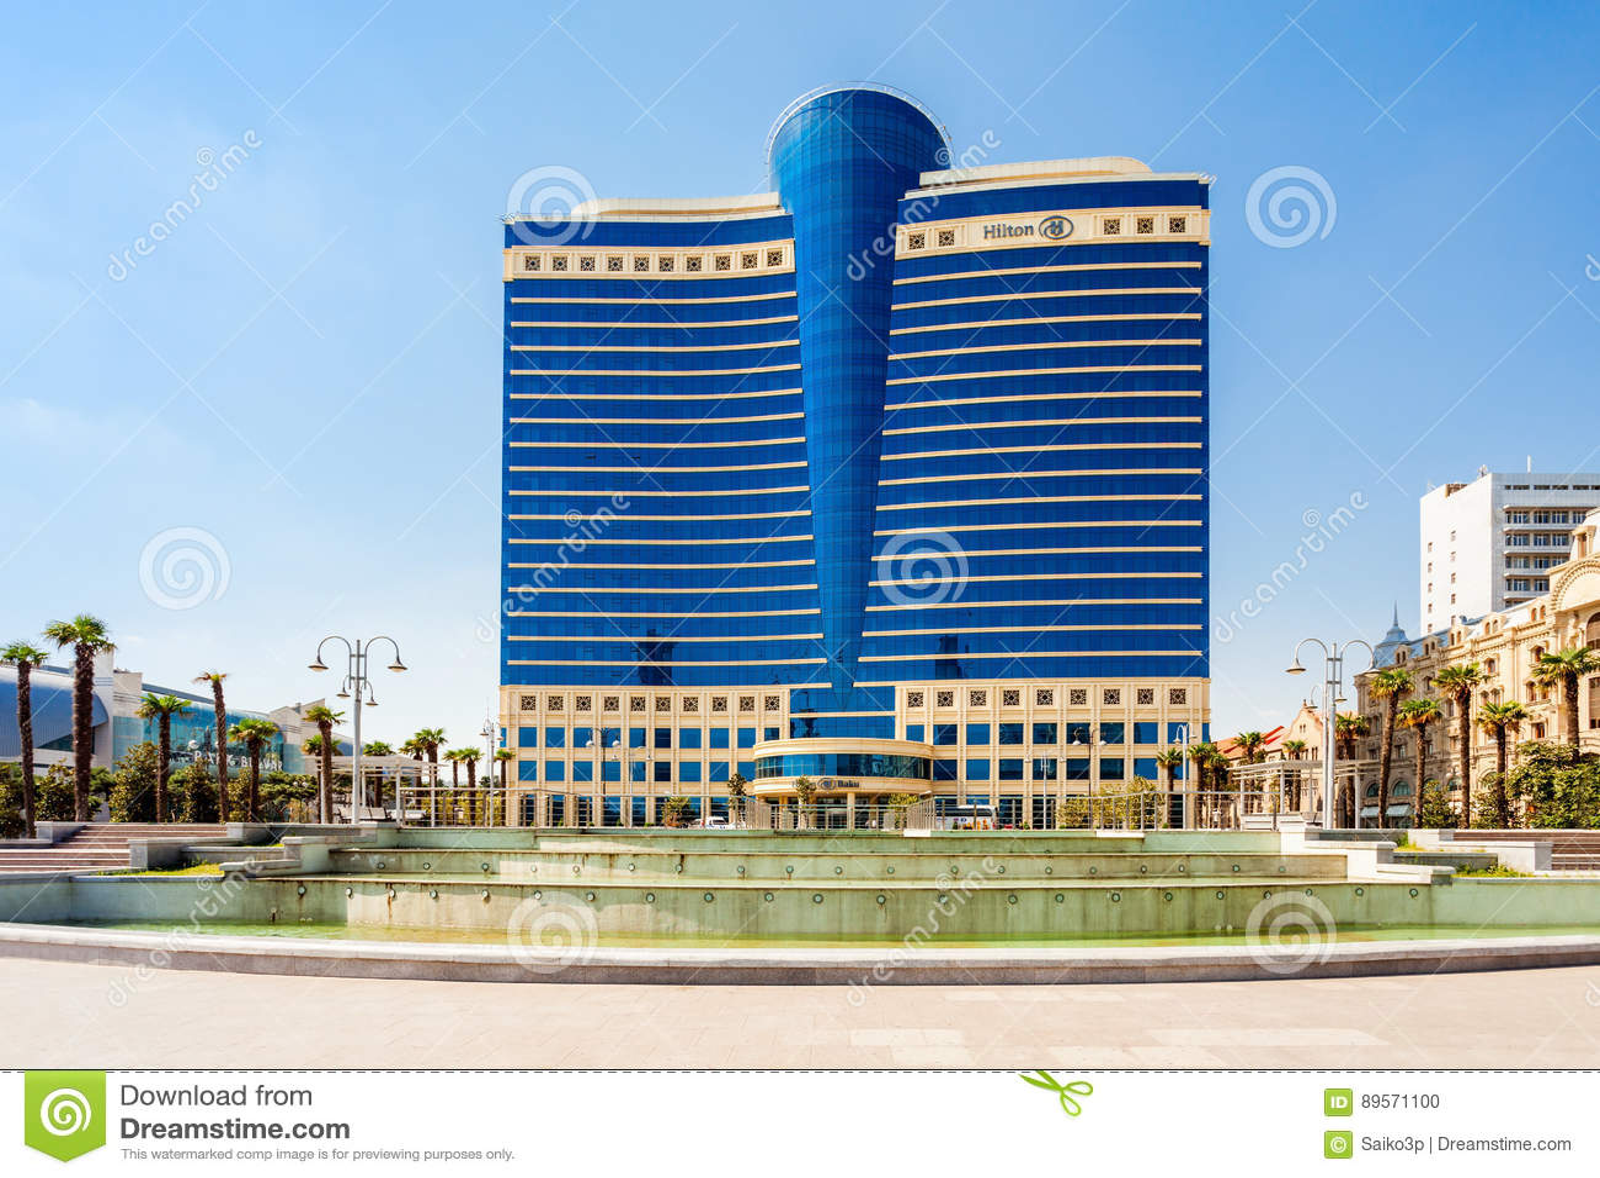 Hilton Baku Hotel, Azerbaijan Editorial Image - Image of